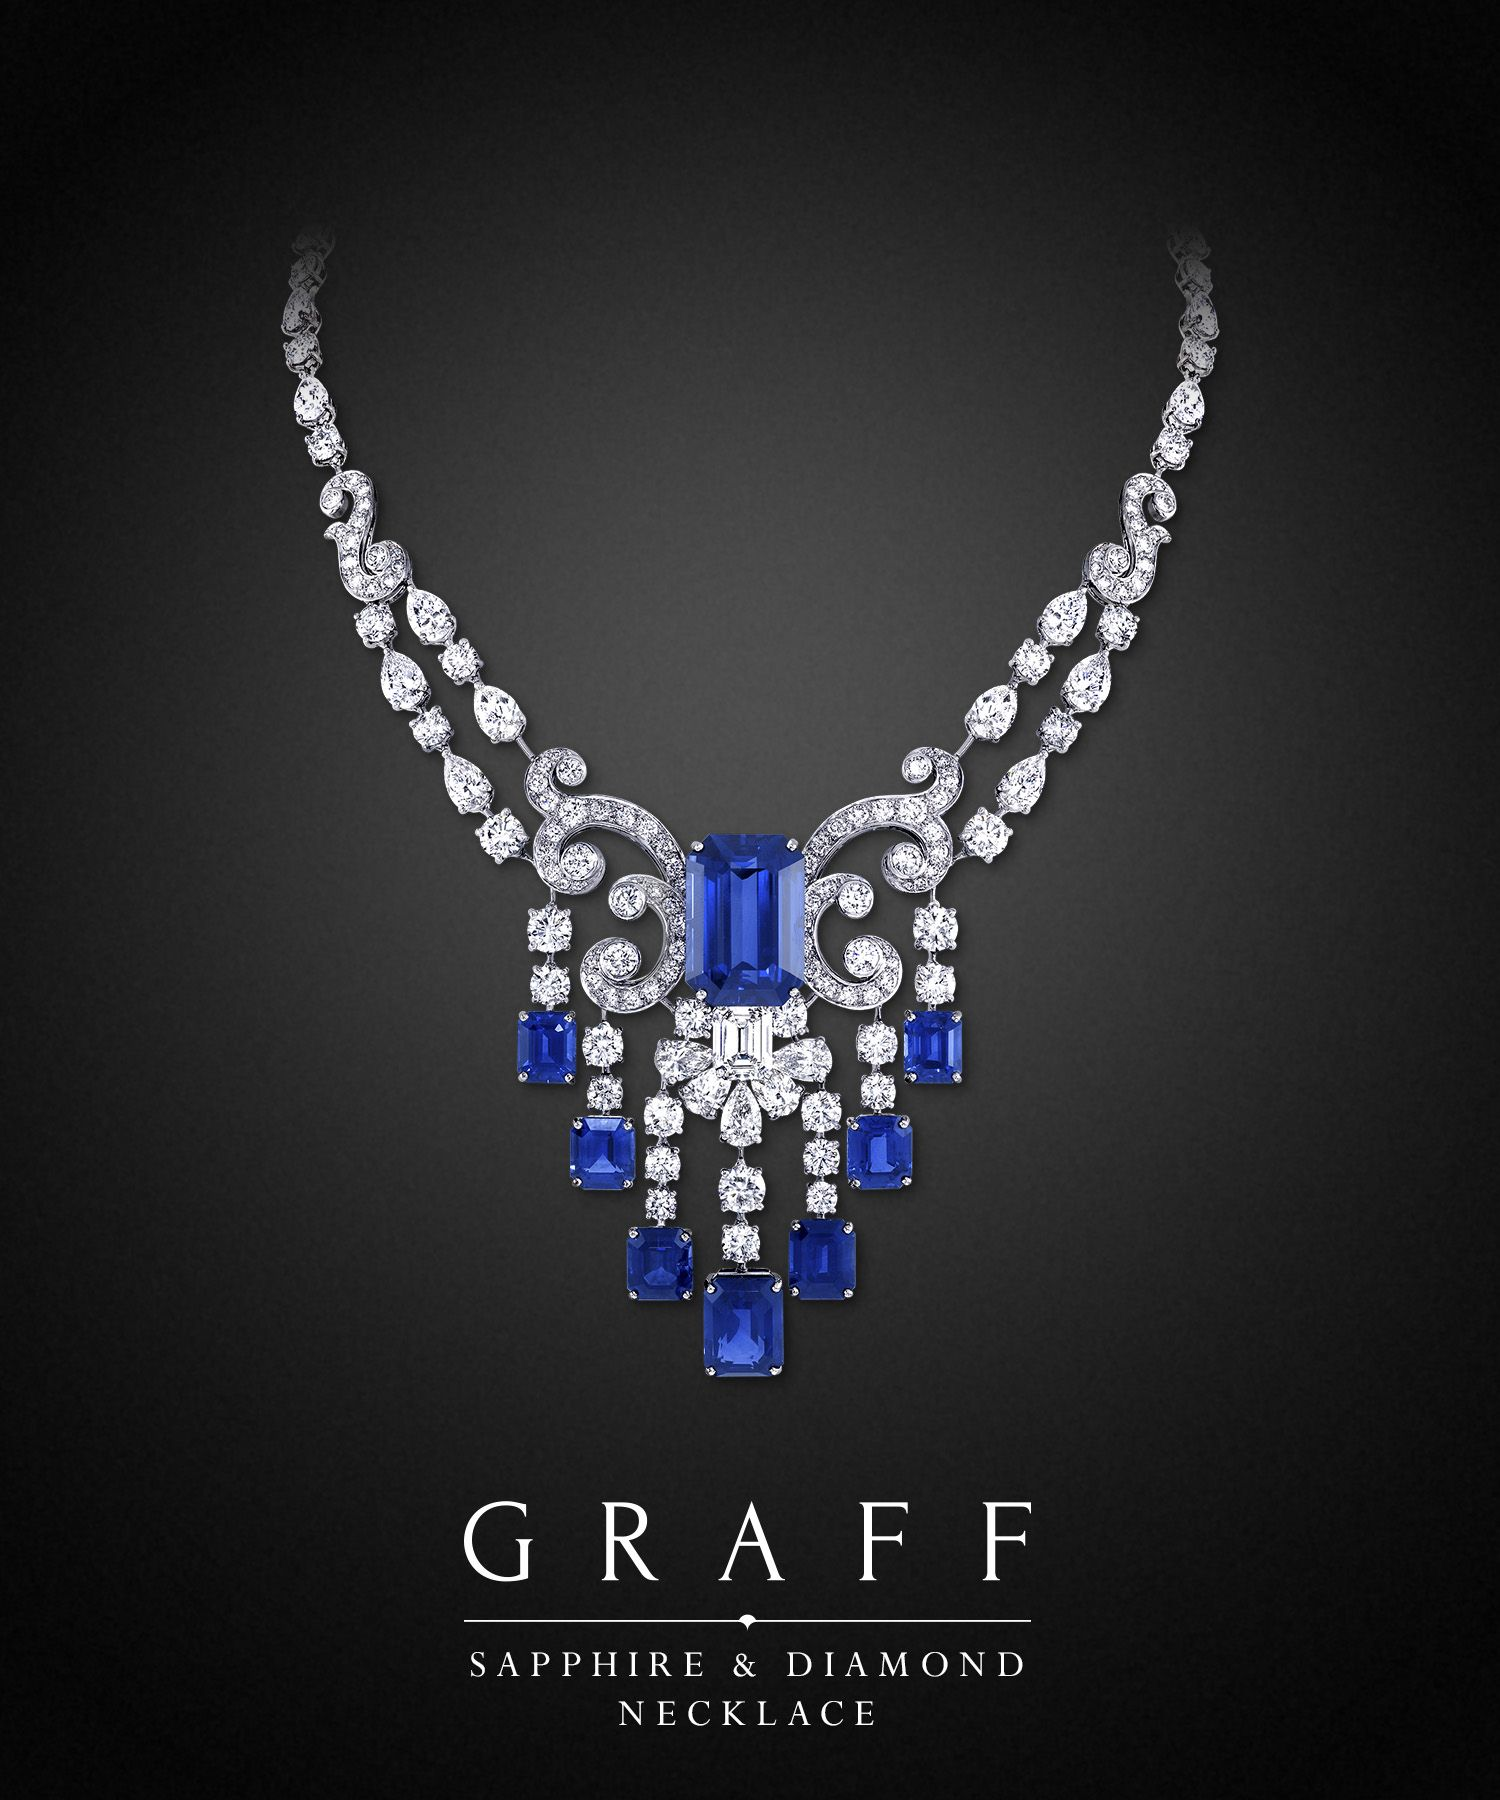 Graff Sapphire and Diamond Necklaces Jewelry